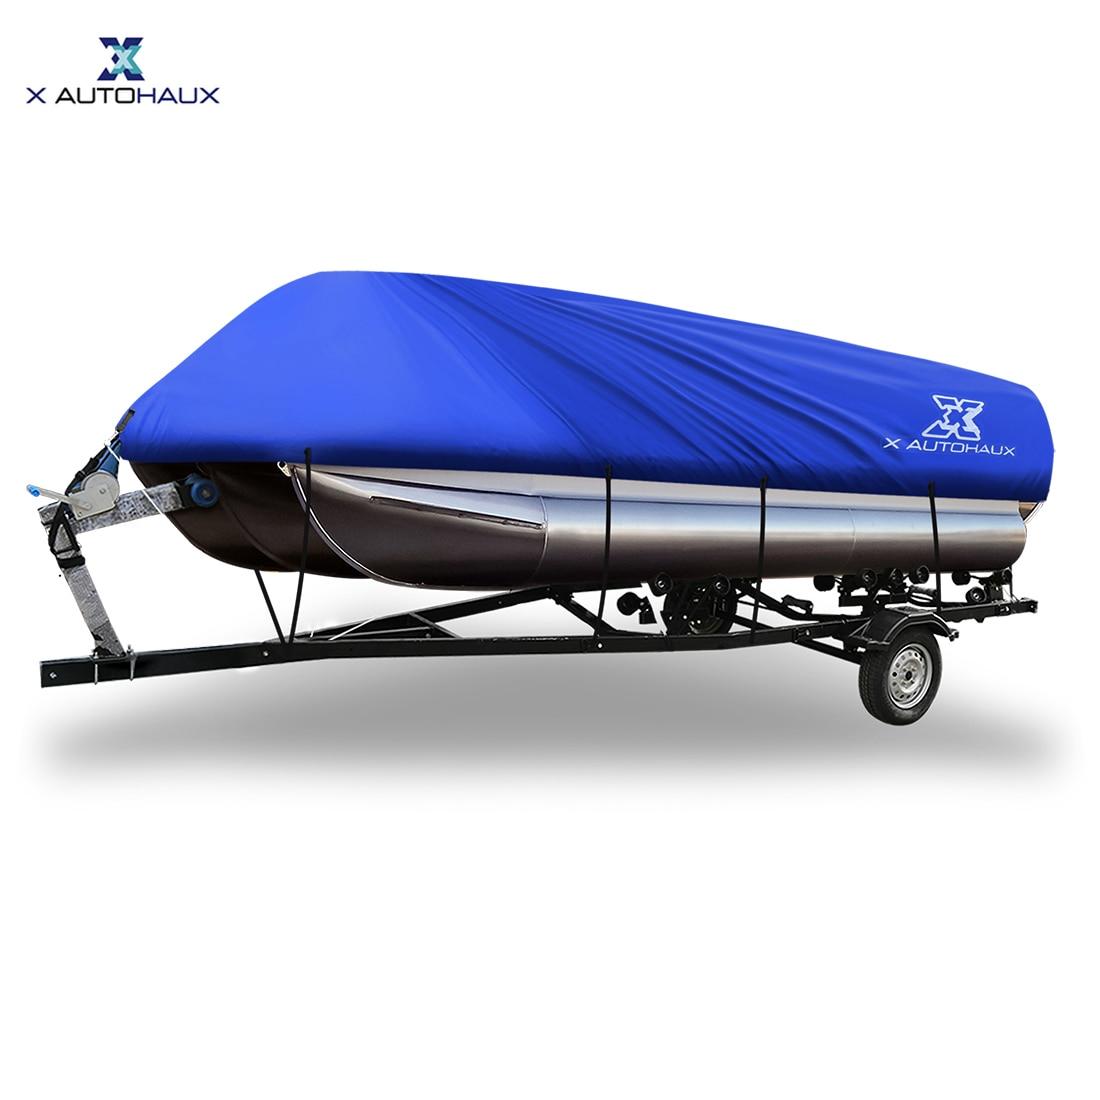 X Autohaux Grey Blue 17-20ft 21-24ft 300D 600/740 X 400cm Boat Cover Waterproof Trailerable for Square Shape BoatsX Autohaux Grey Blue 17-20ft 21-24ft 300D 600/740 X 400cm Boat Cover Waterproof Trailerable for Square Shape Boats